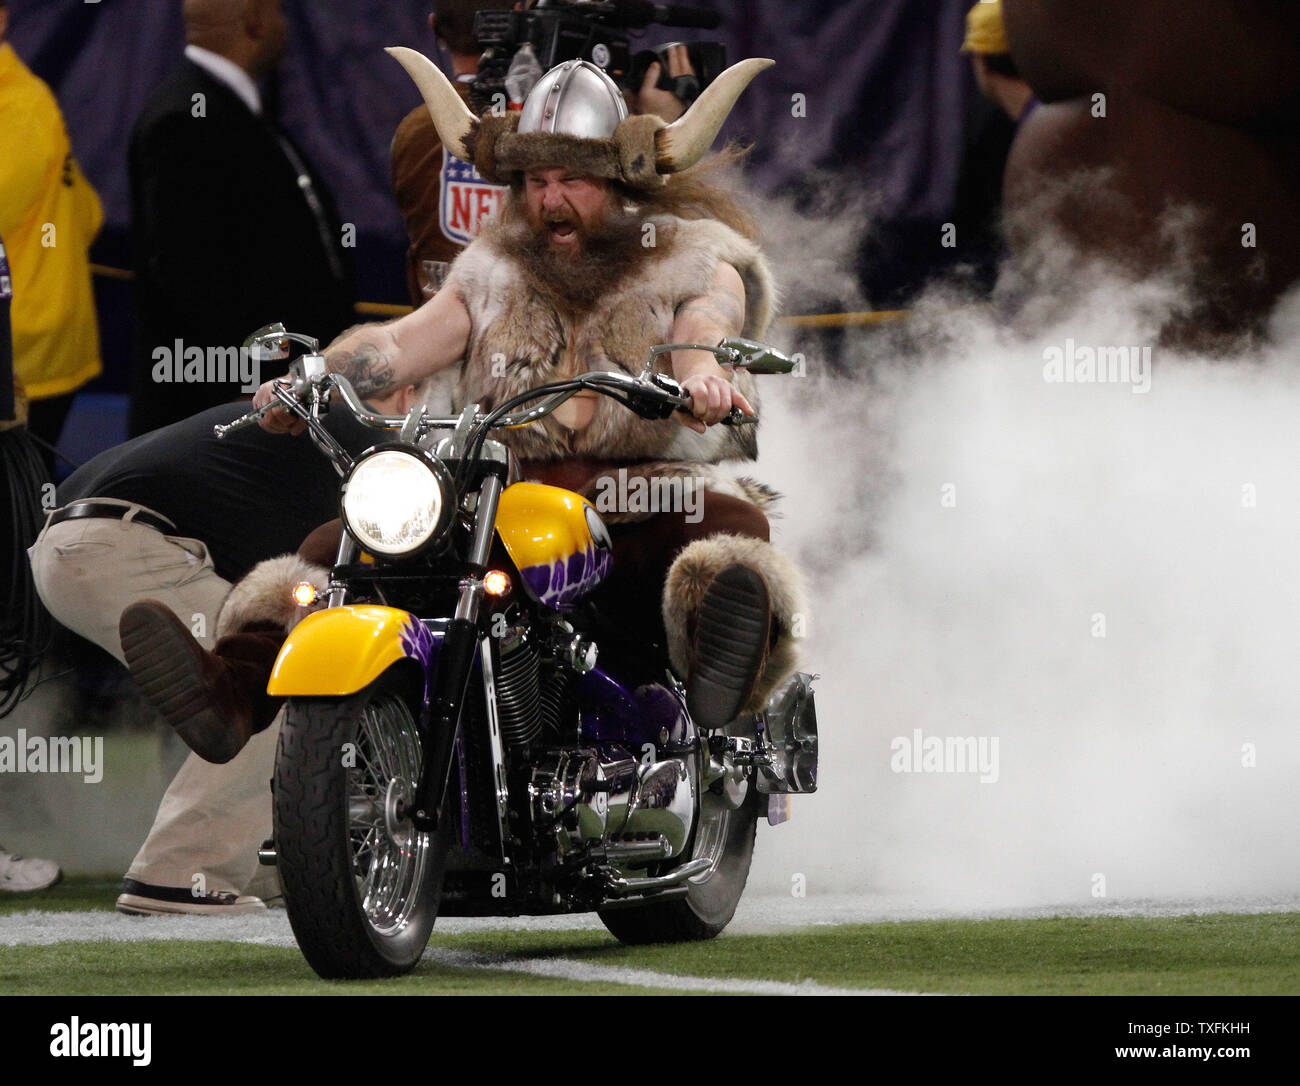 Joseph Juranitch The Minnesota Vikings Mascot Ragnar Rides